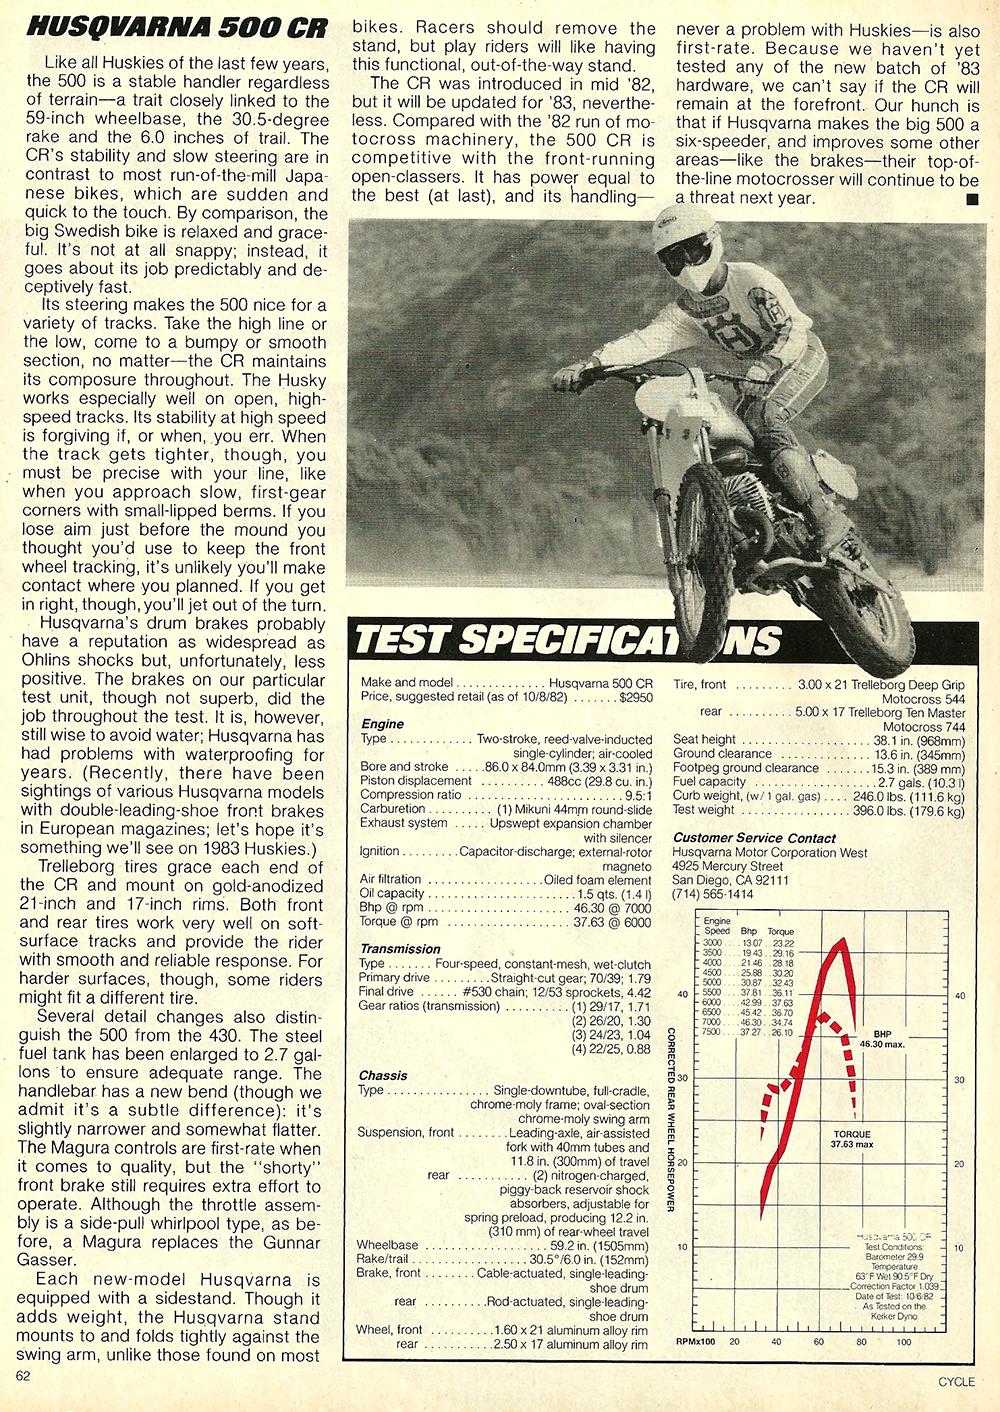 1983 Husqvarna 500 CR road test 7.jpg